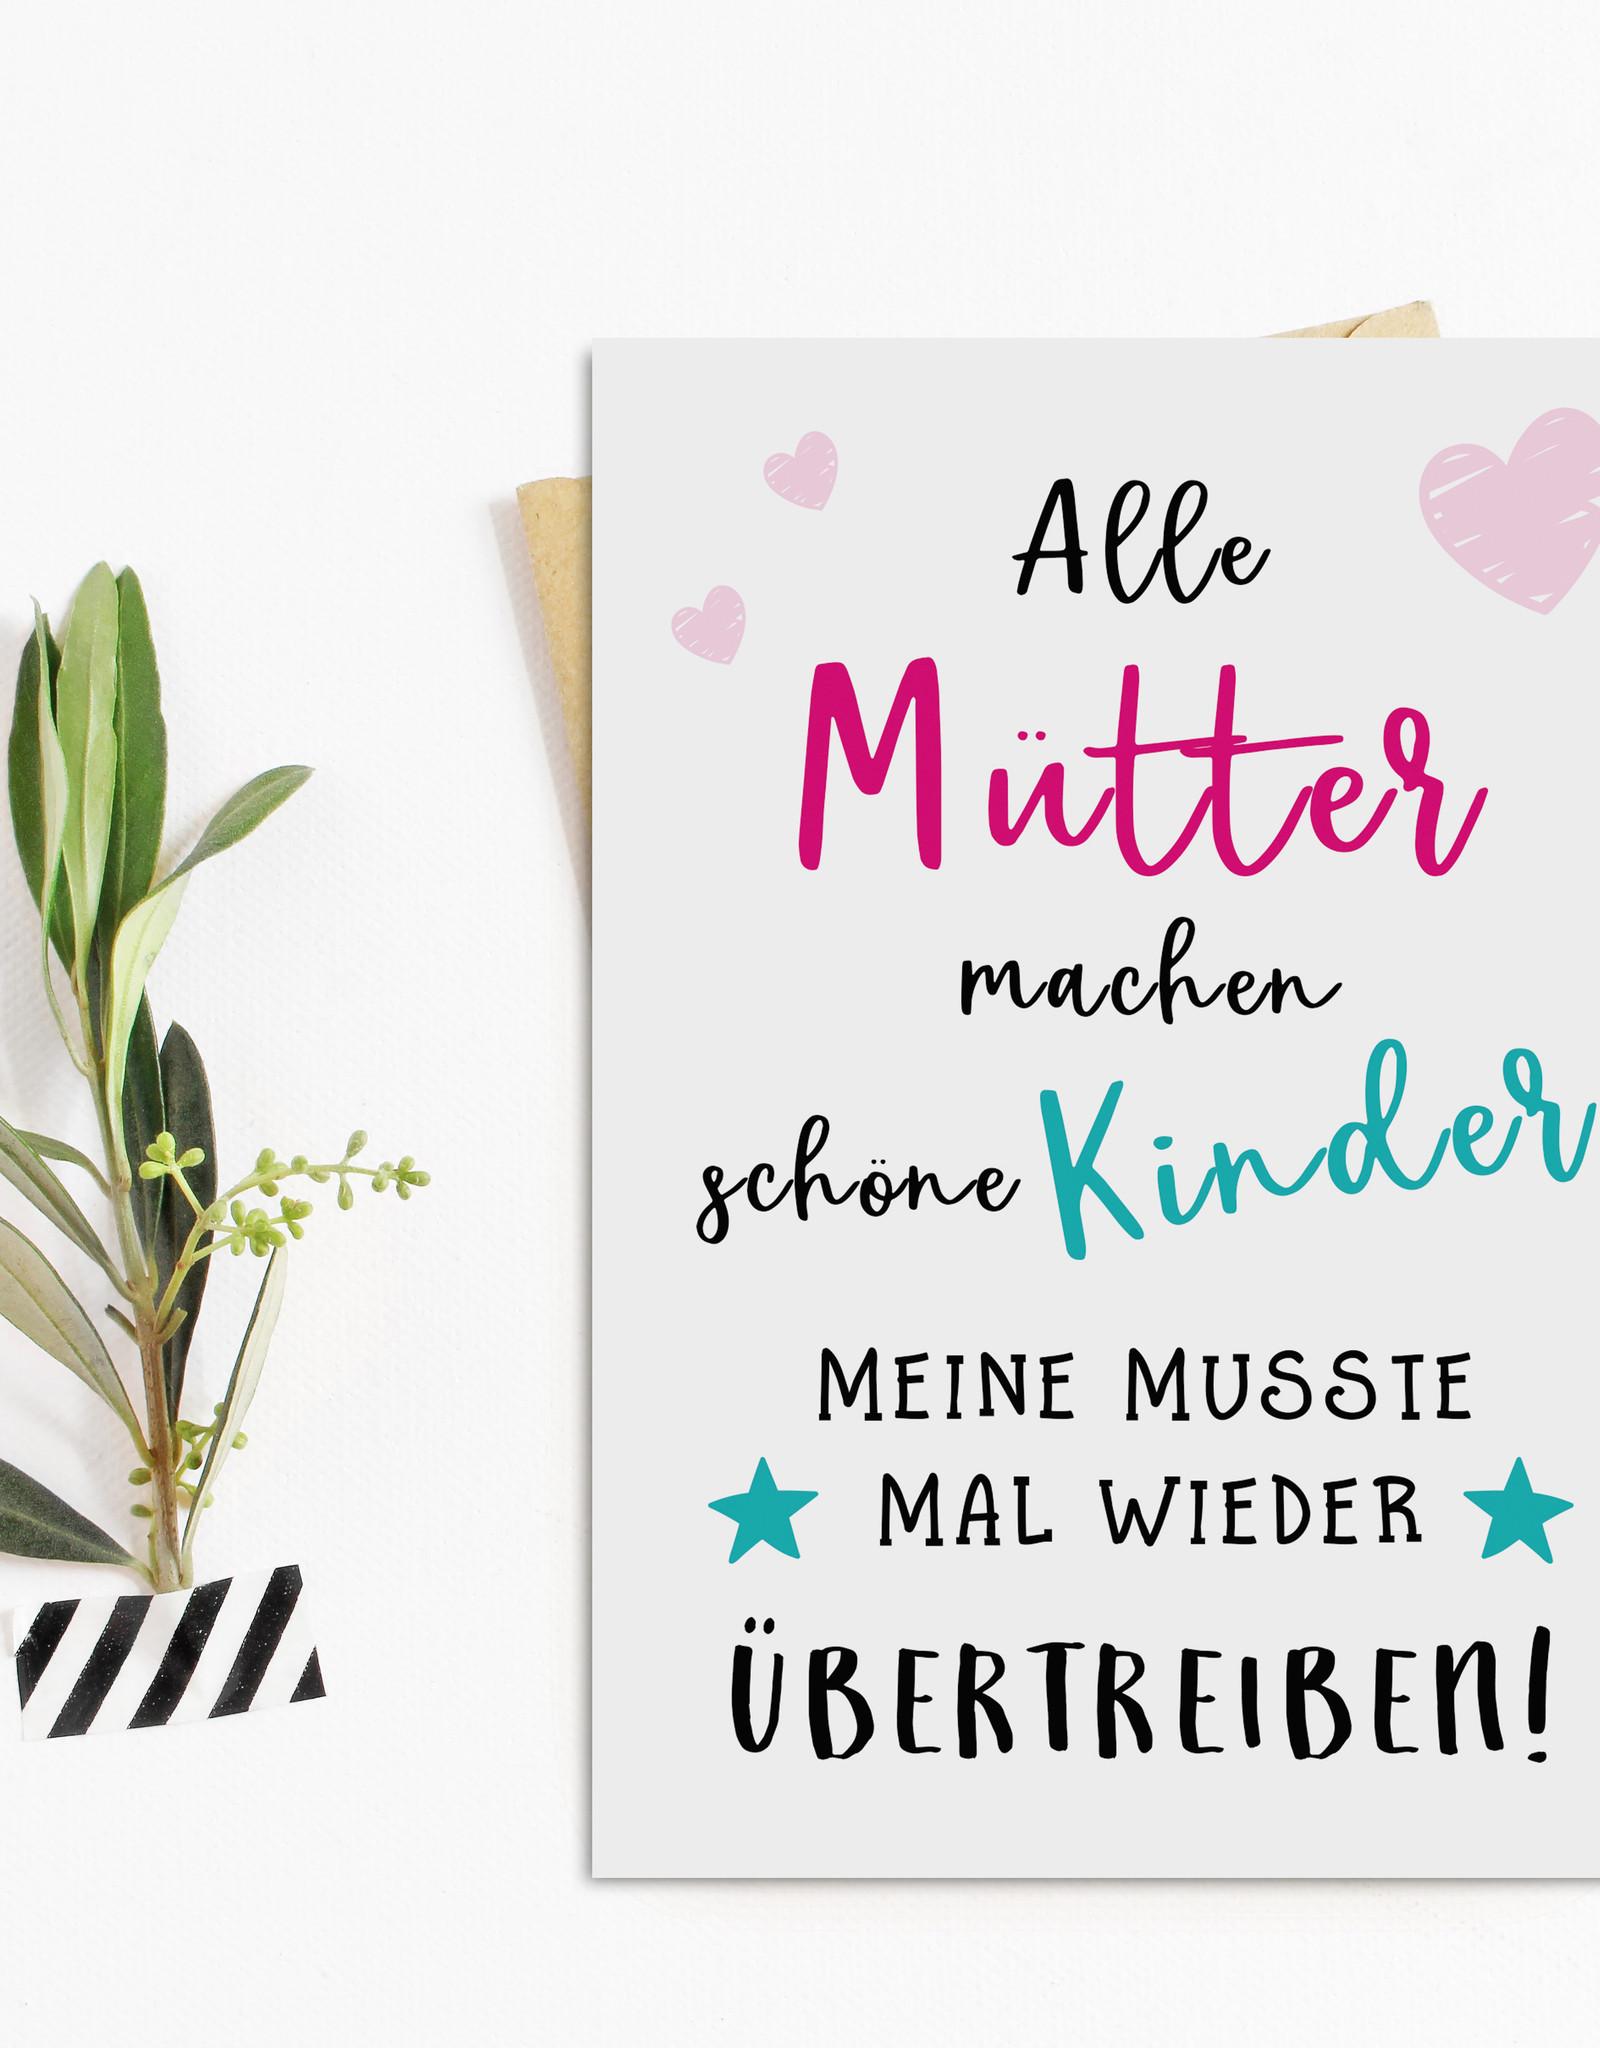 Muttertagskarte Postkarte Muttertag SCHÖNE KINDER Muttertag Karte, Muttertag Geschenk, Muttertag Geschenkideen